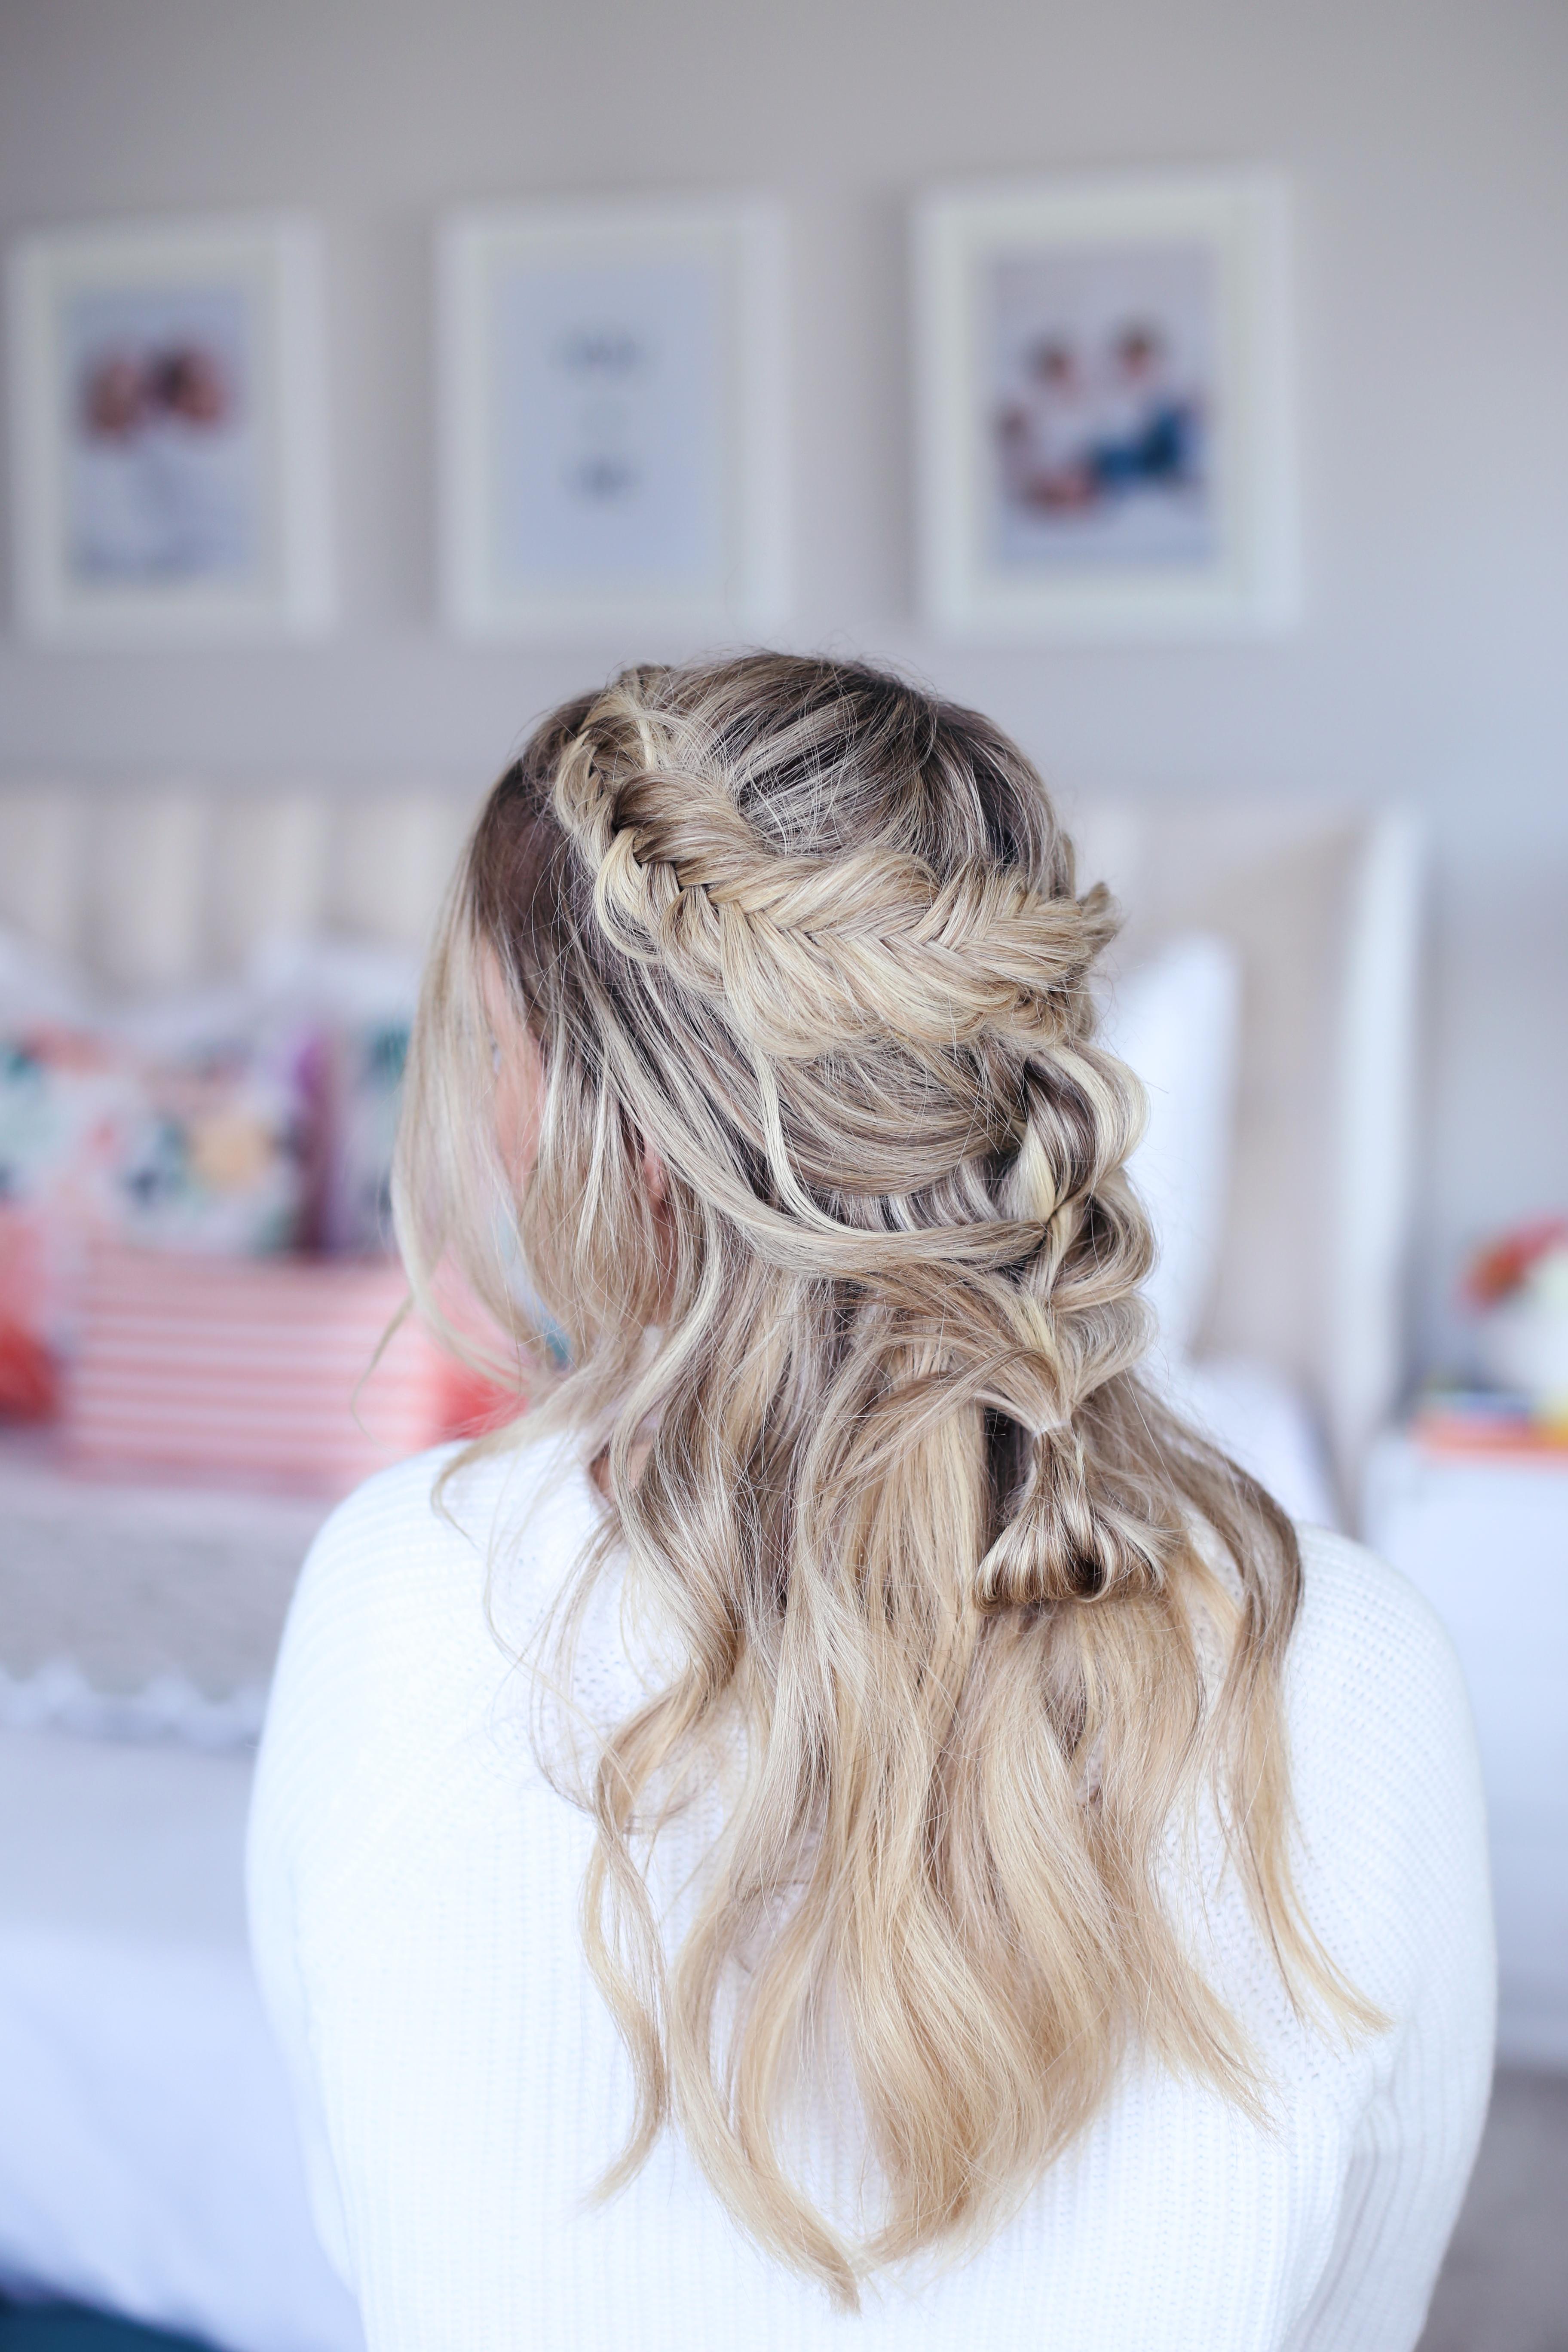 Mixed Braid Half Up | Cute Girls Hairstyles